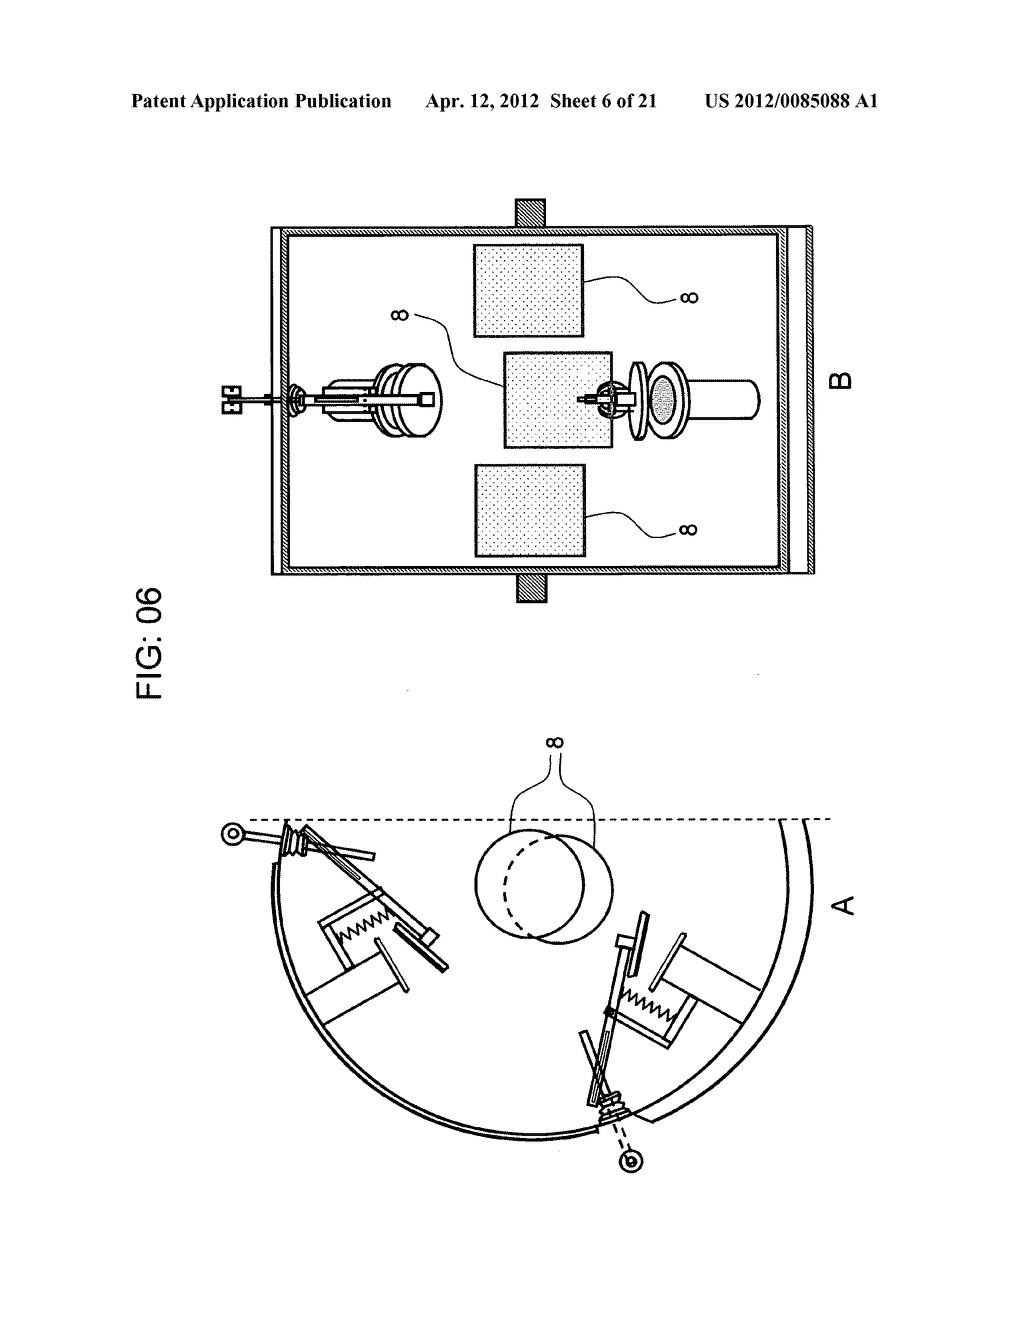 gravity buoyancy generator diagram, schematic, and image 07Buoyancy Diagram Buoyancy Generator Sketch #8